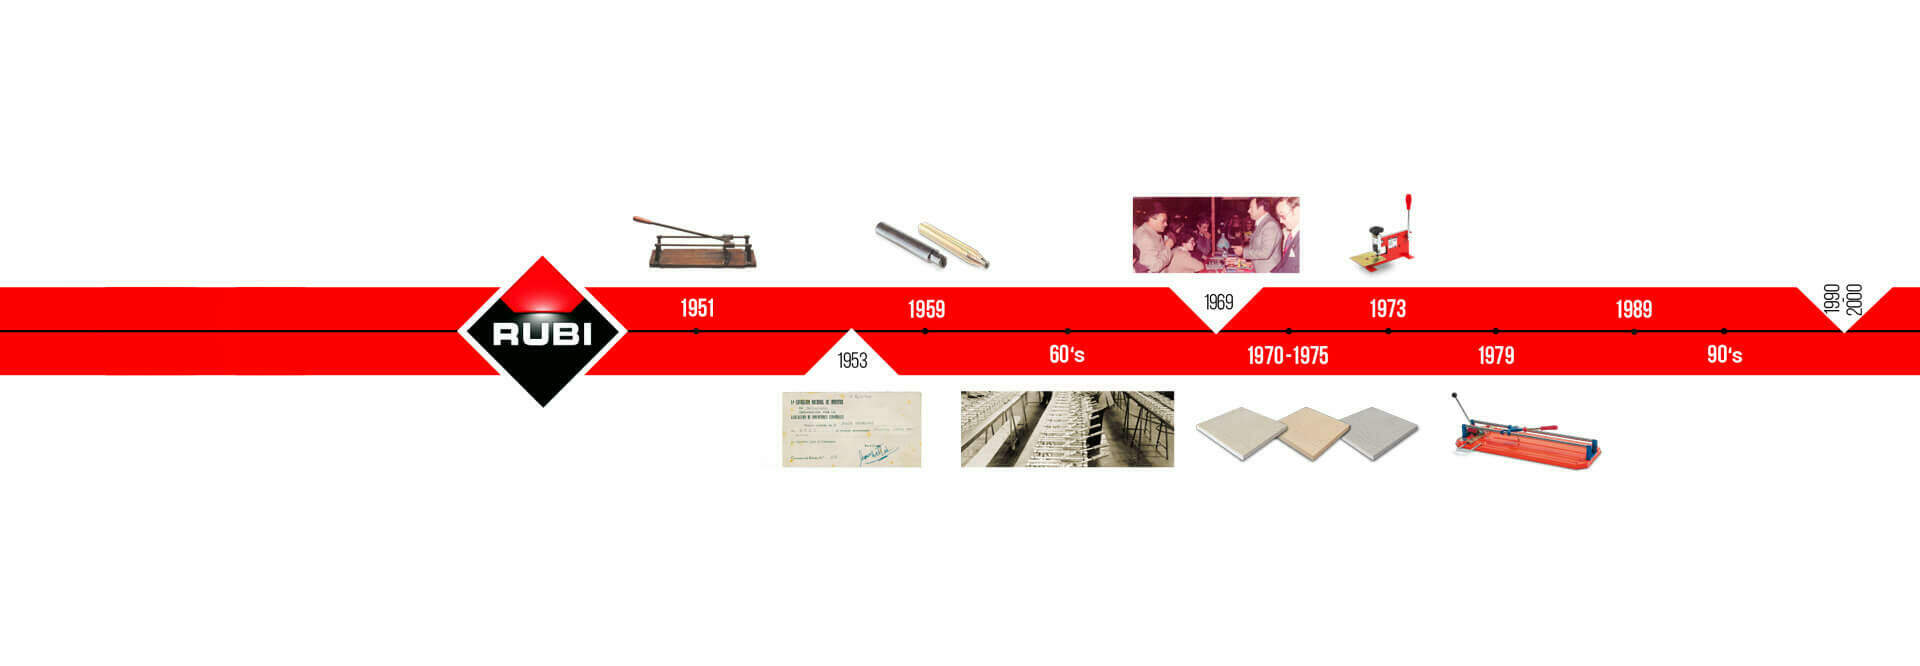 RUBI, innovation et évolution depuis 1951...